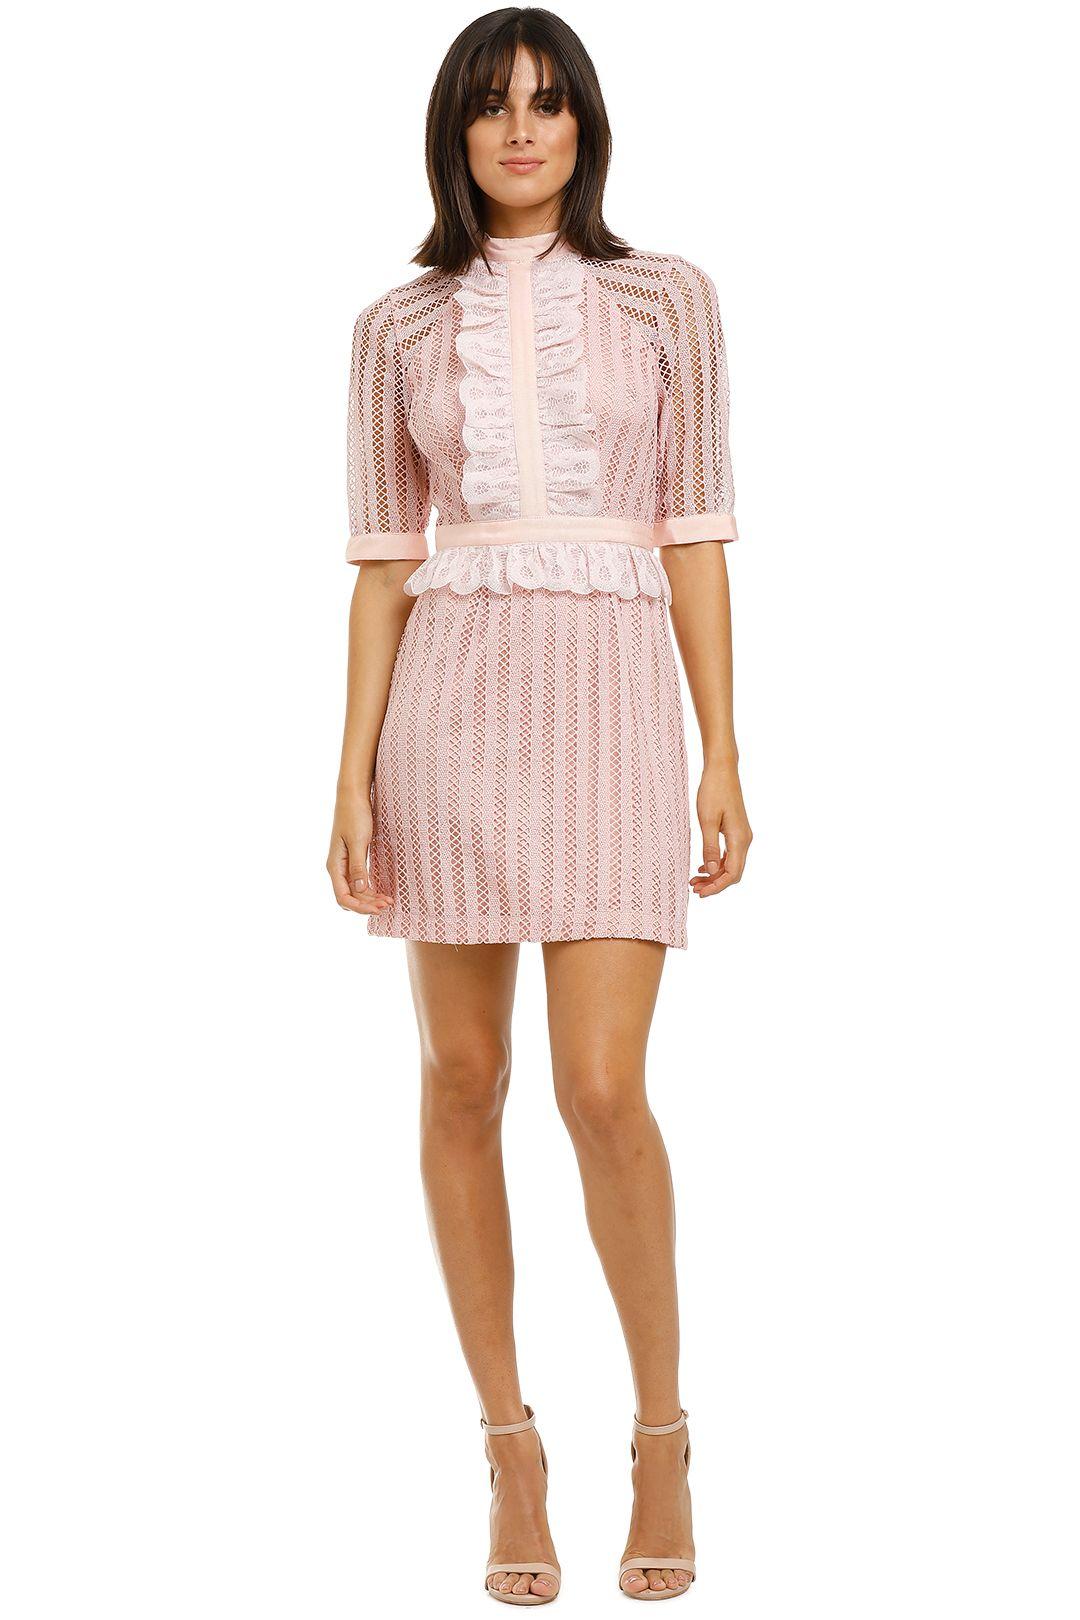 Keepsake-the-Label-Portrait-Mini-Dress-Blush-Front